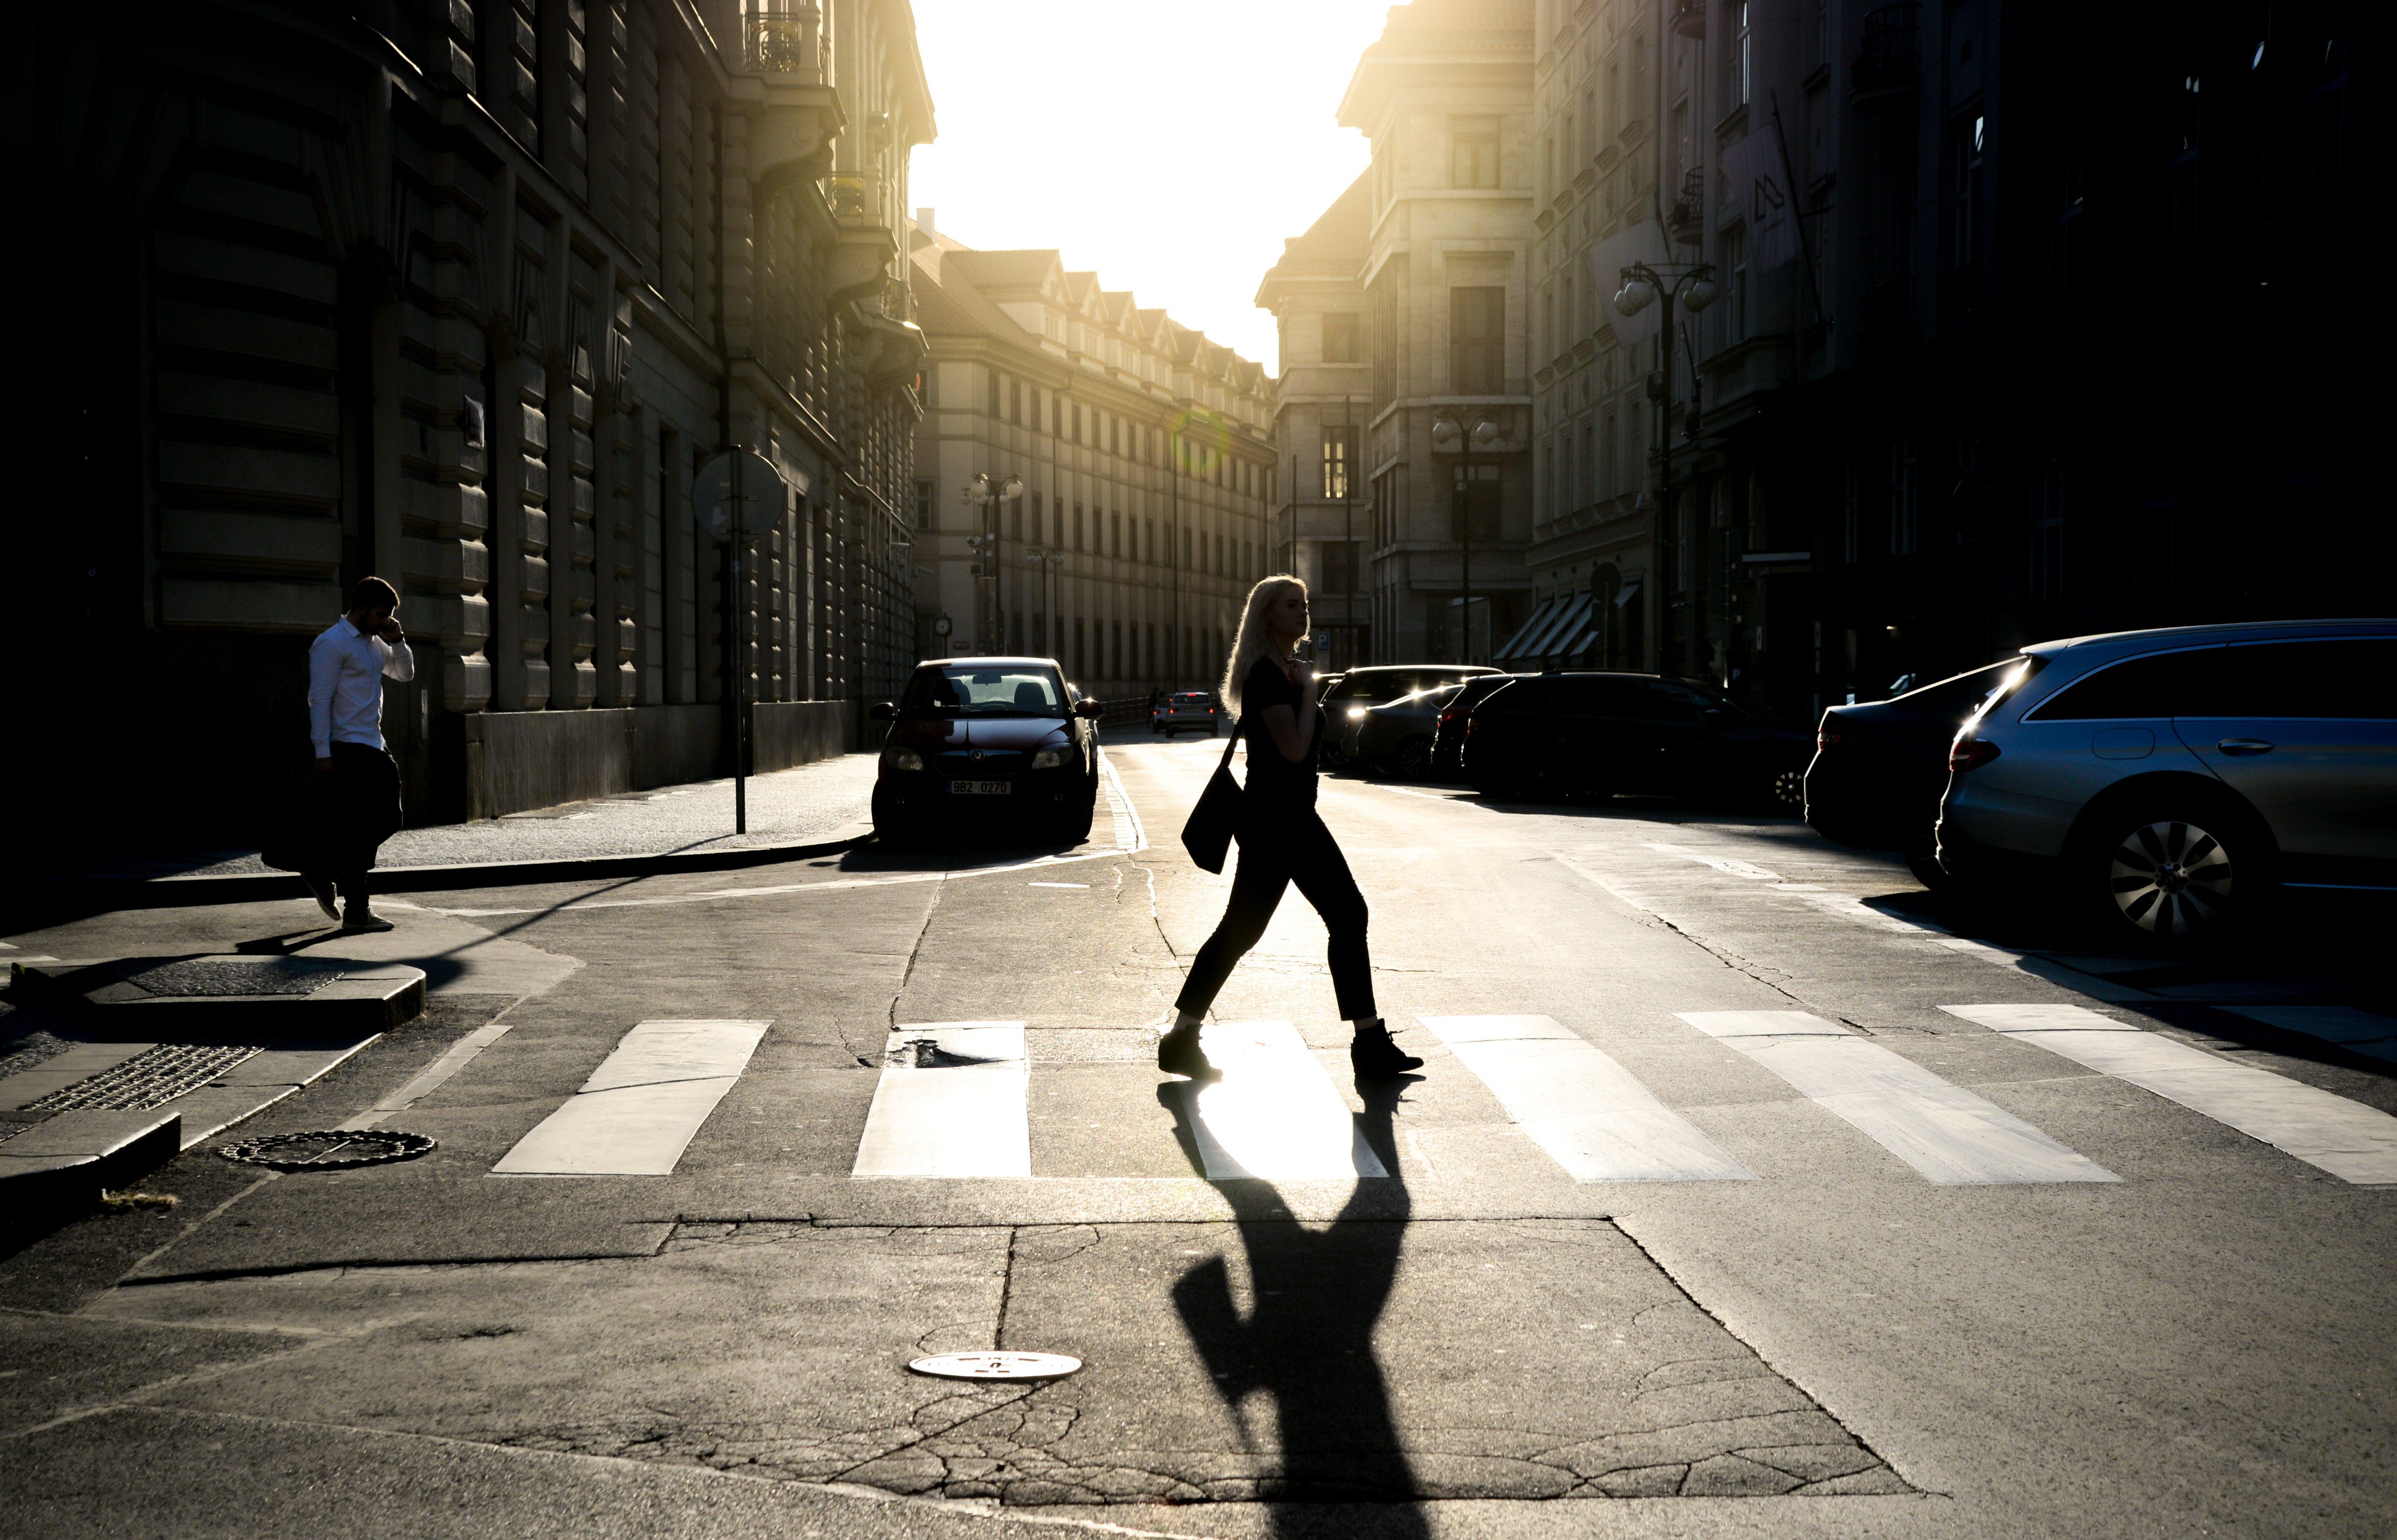 Základová fotografie zdarma na téma budovy, chůze, dlažba, dospělý